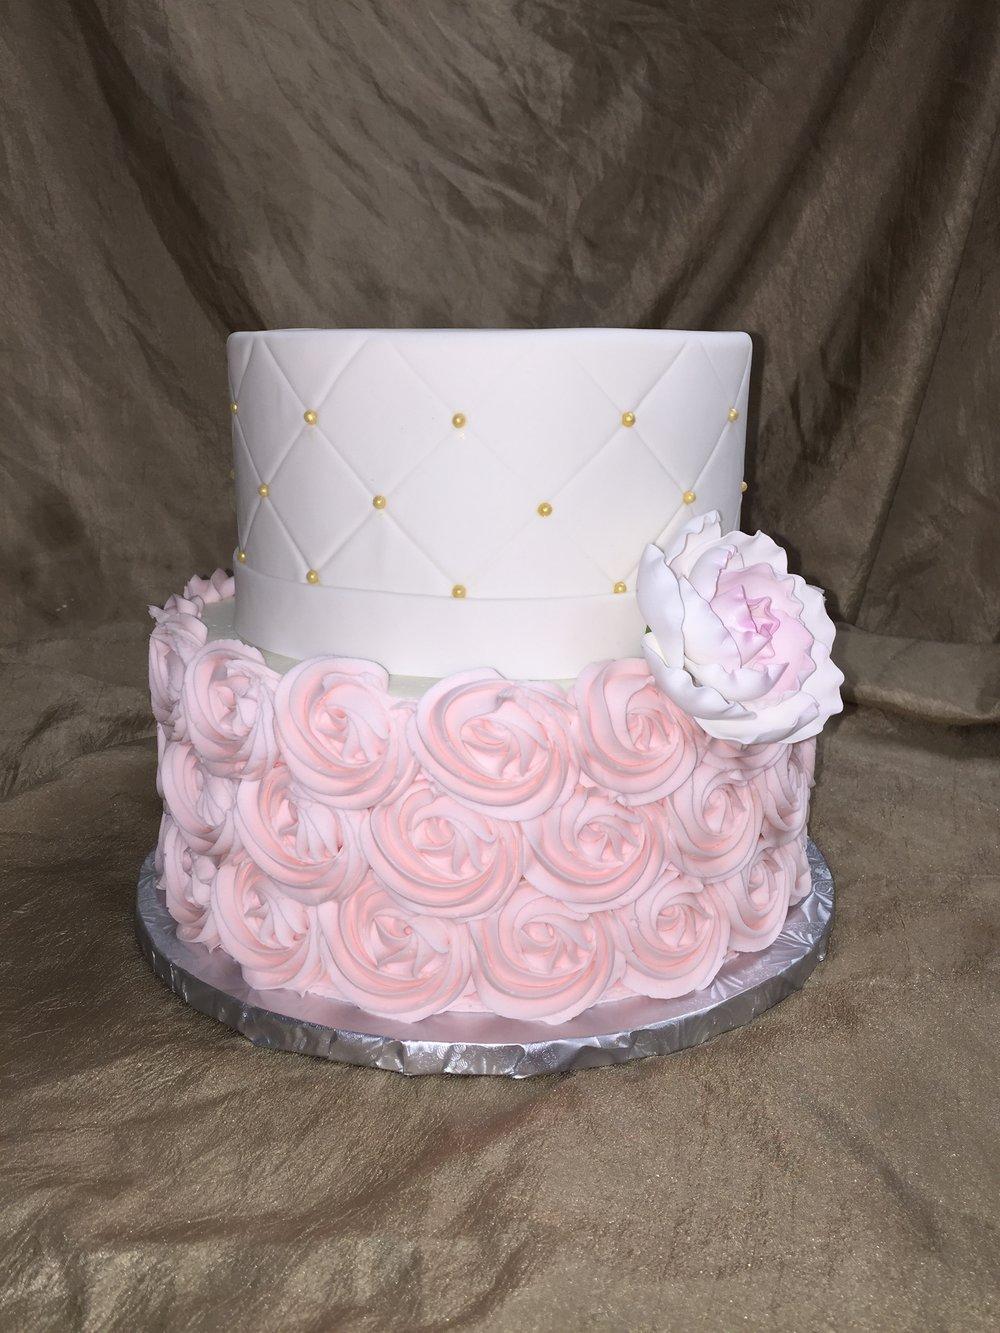 Birthday Cakes — YIA YIA'S BAKERY